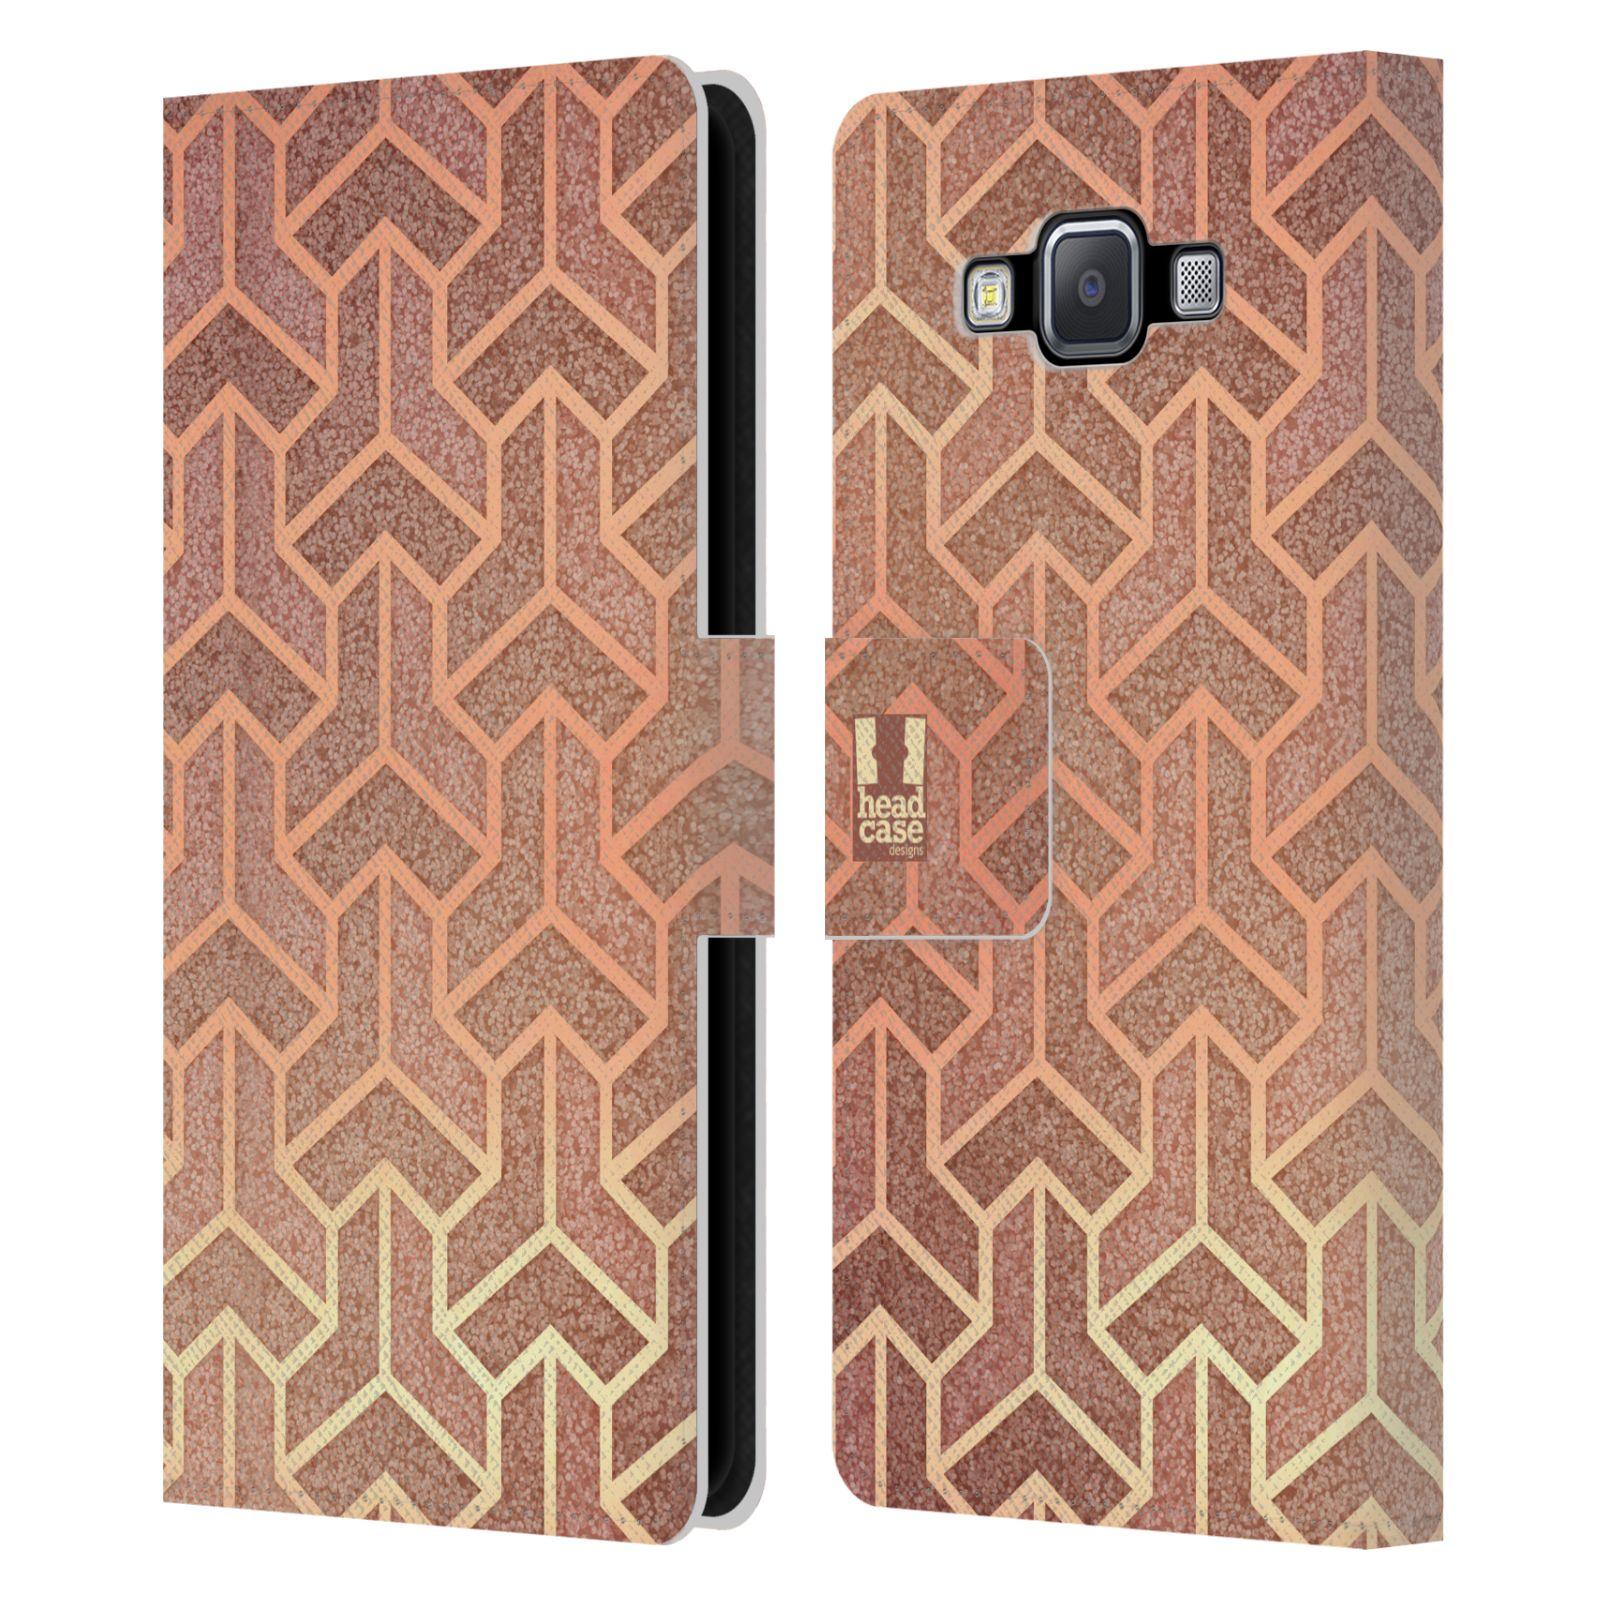 head case designs texture art deco muster brieftasche h lle f r samsung handys 2 ebay. Black Bedroom Furniture Sets. Home Design Ideas